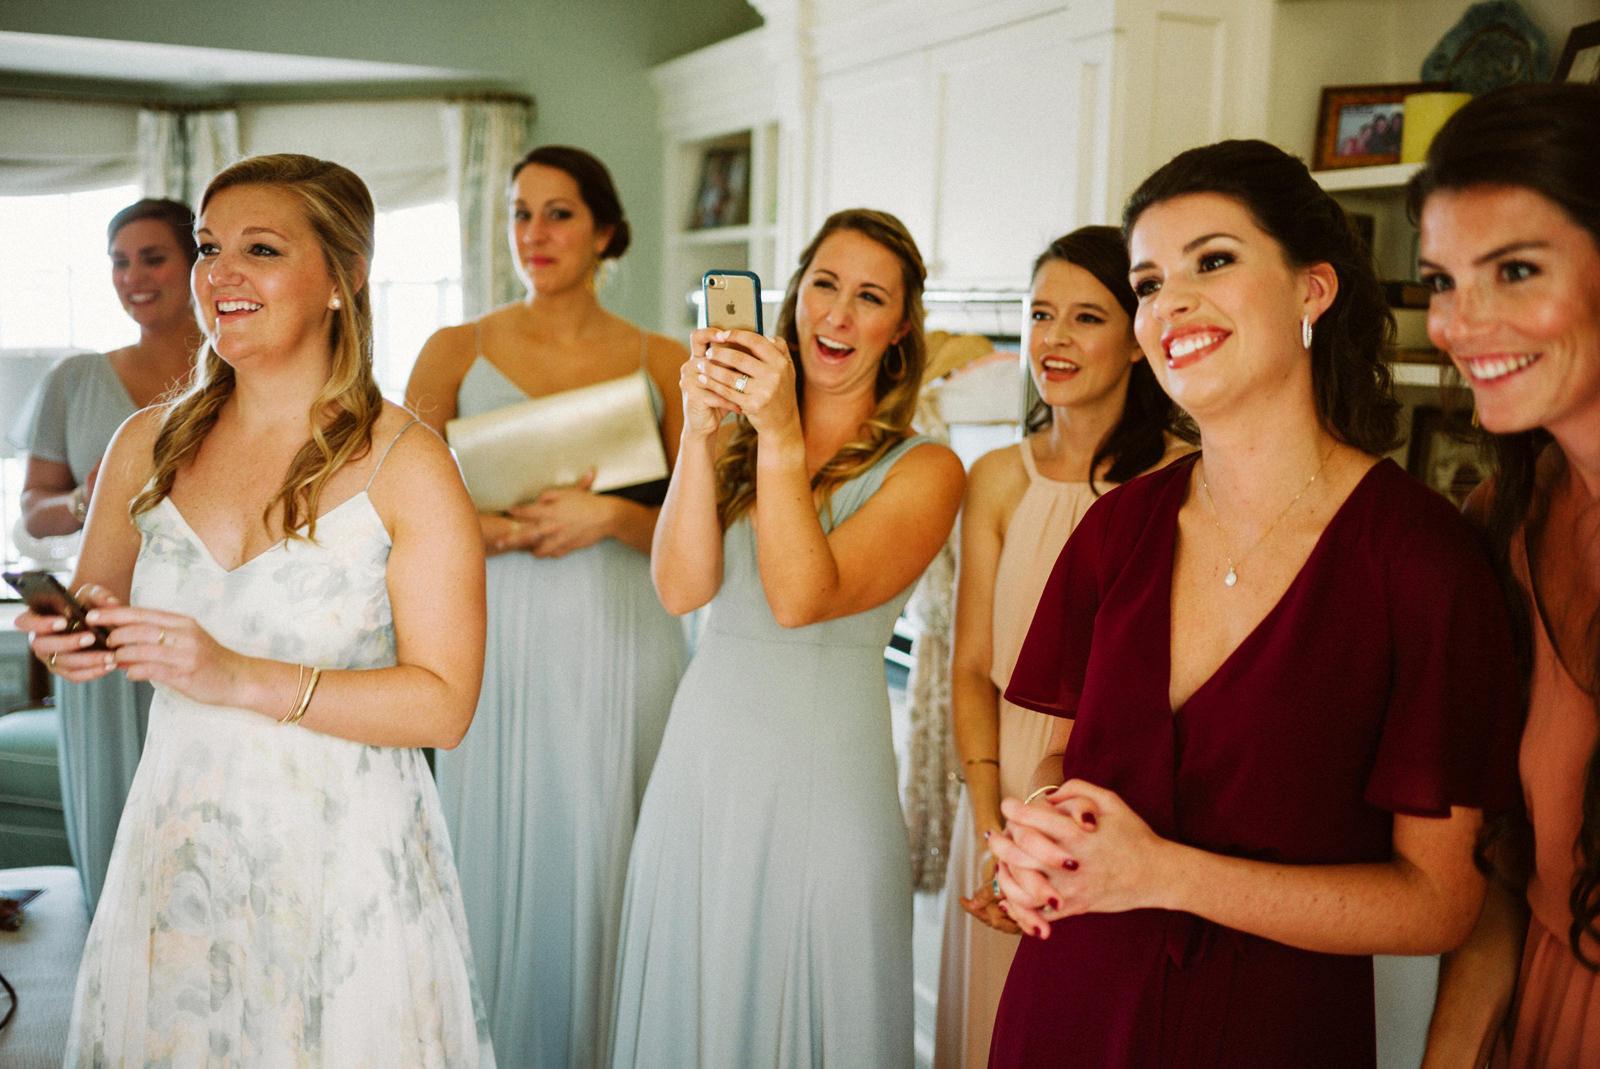 bridgeport-wedding-032 BRIDGEPORT, CONNECTICUT BACKYARD WEDDING